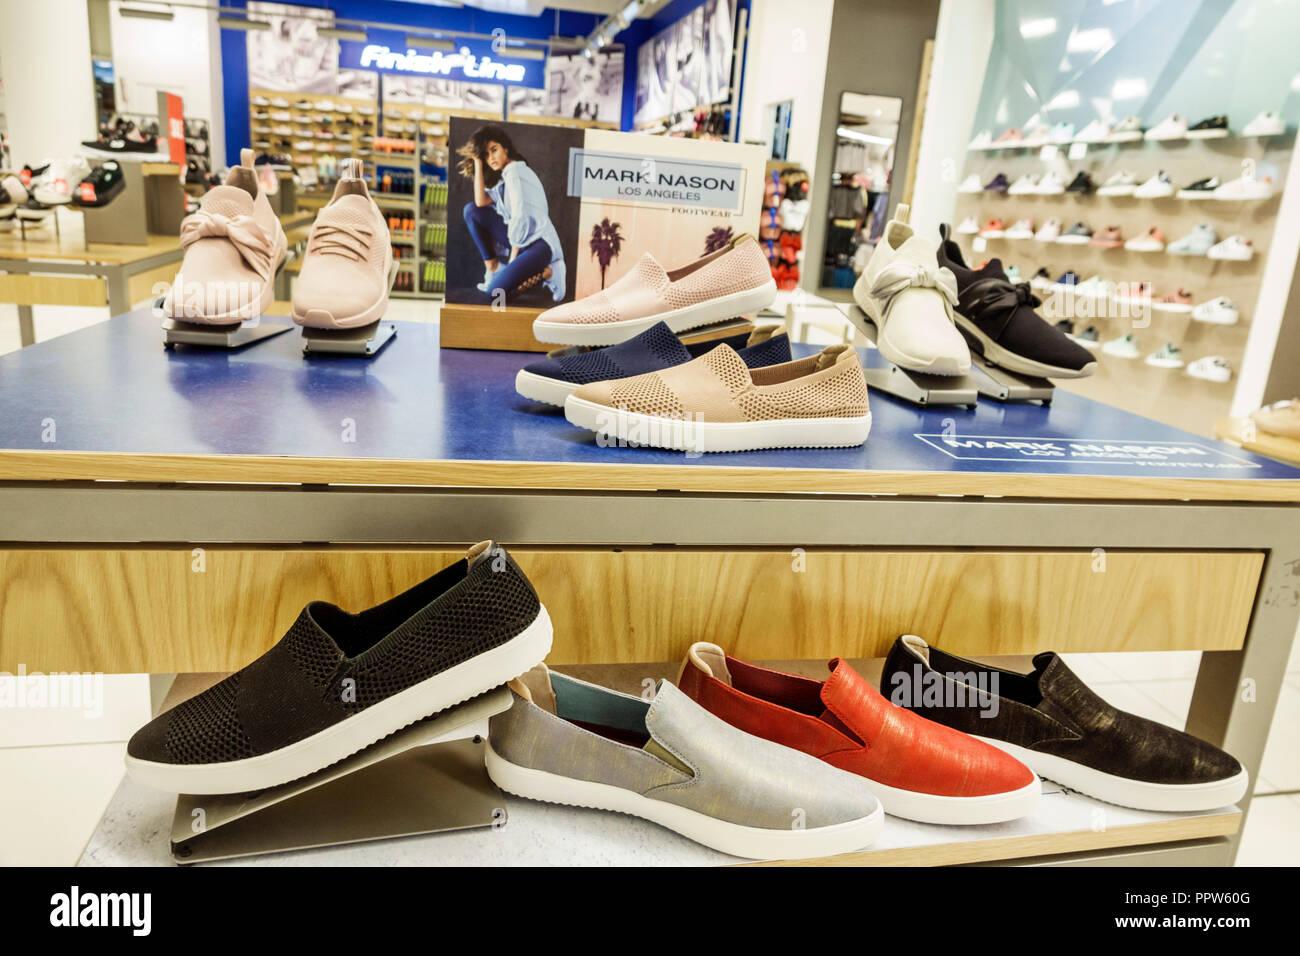 1ad4fe29929a8 Miami Florida Kendall Dadeland Mall Shopping Magazzino Macy s display  interno vendita Mark Nason scarpe donna sneakers